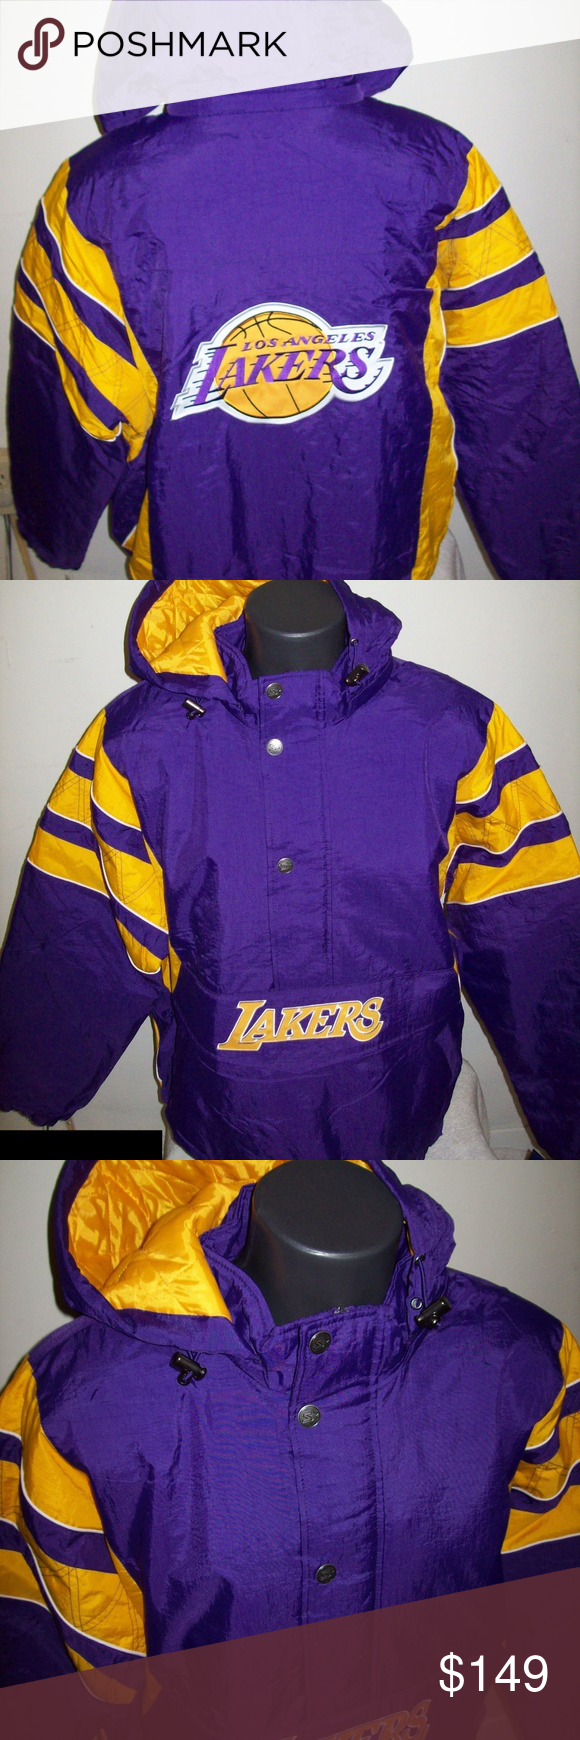 Los Angeles La Lakers Starter Half Zip Jacket Boutique Half Zip Zip Jackets Jackets